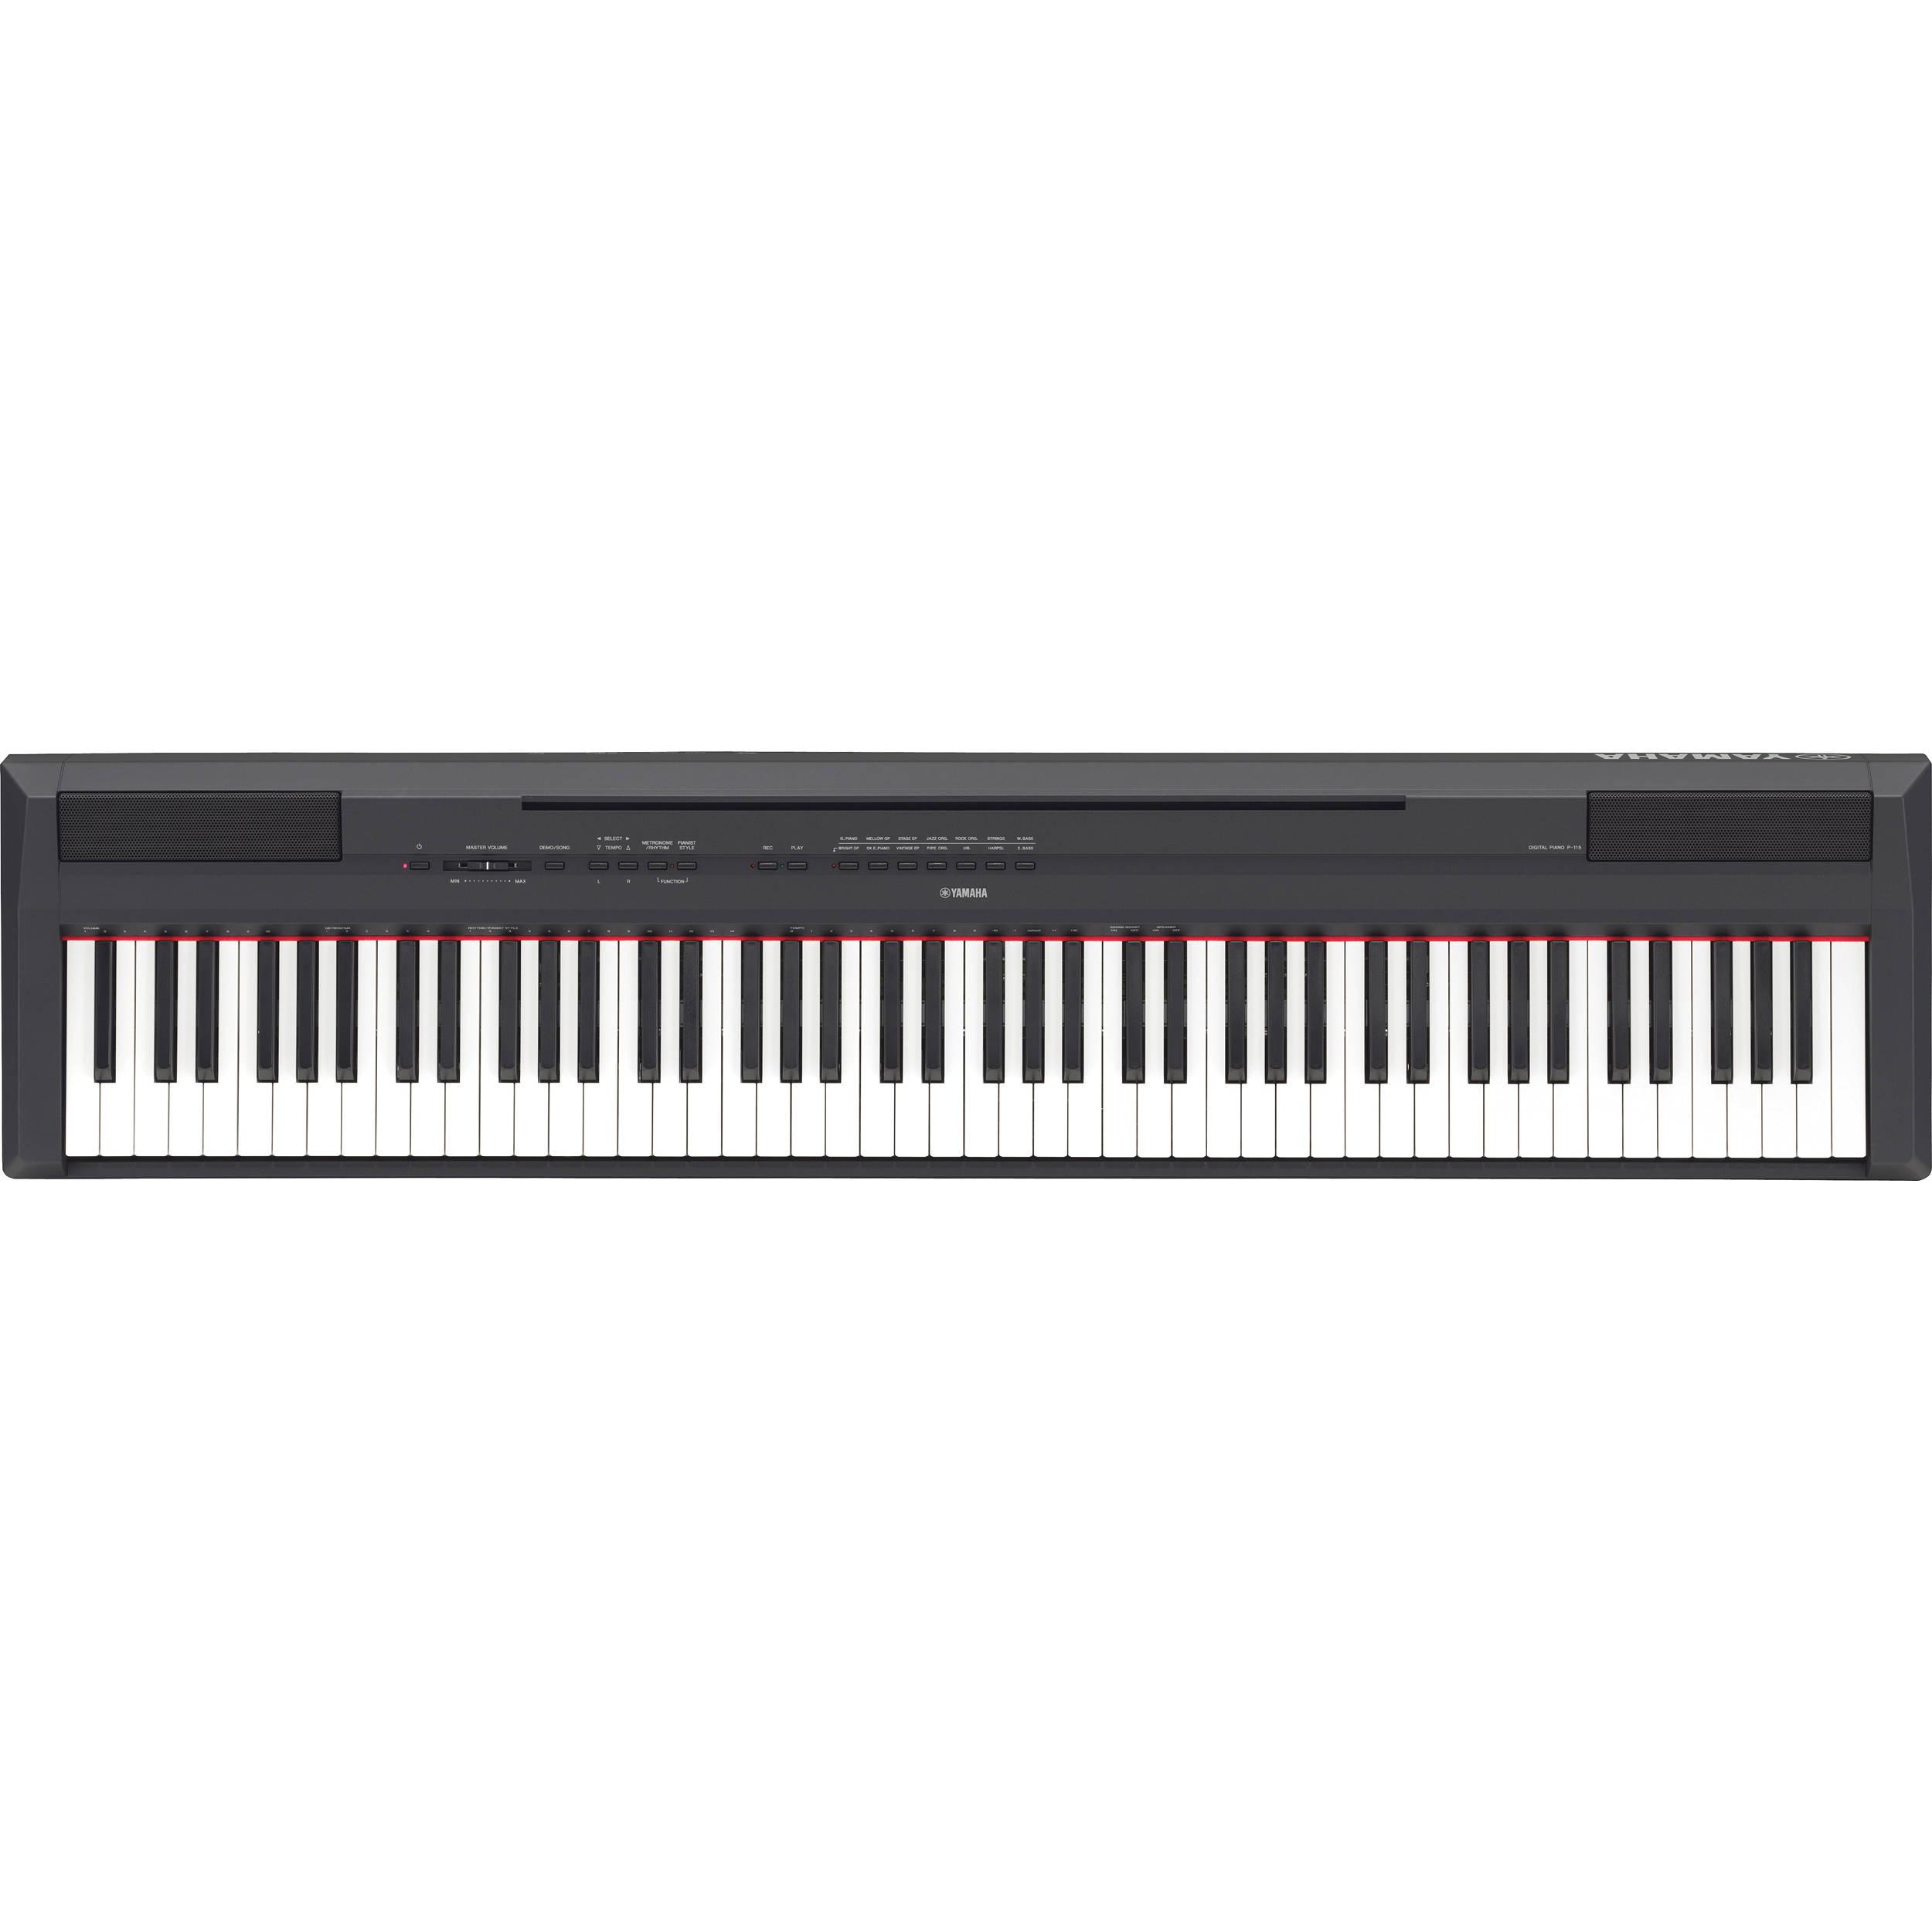 Yamaha Digital Piano Price List